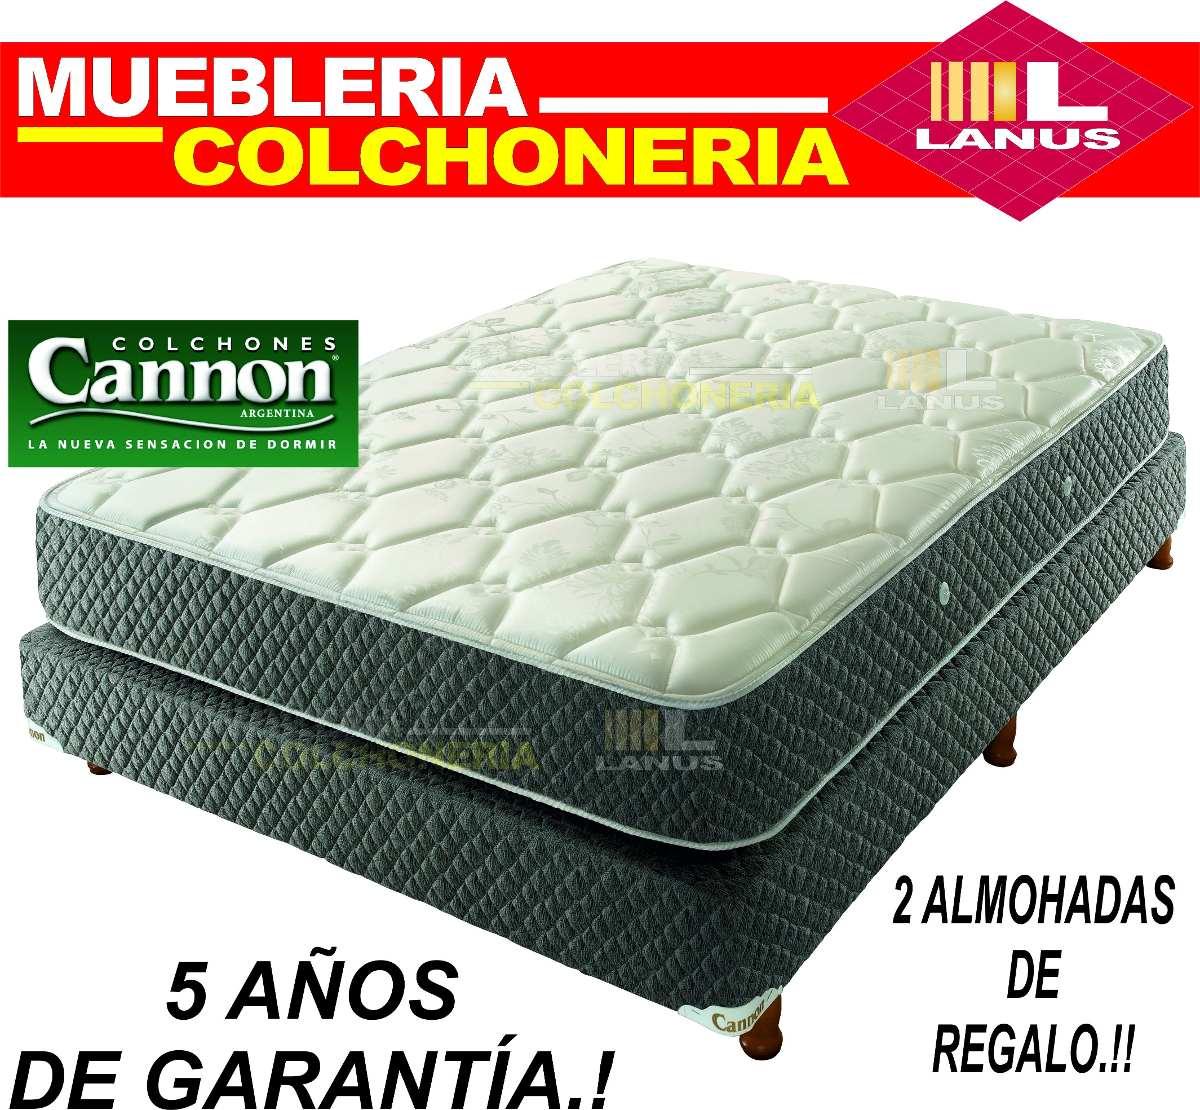 Sommier Y Colchon Cannon Doral 2 Plazas 140x190 + Almohadas